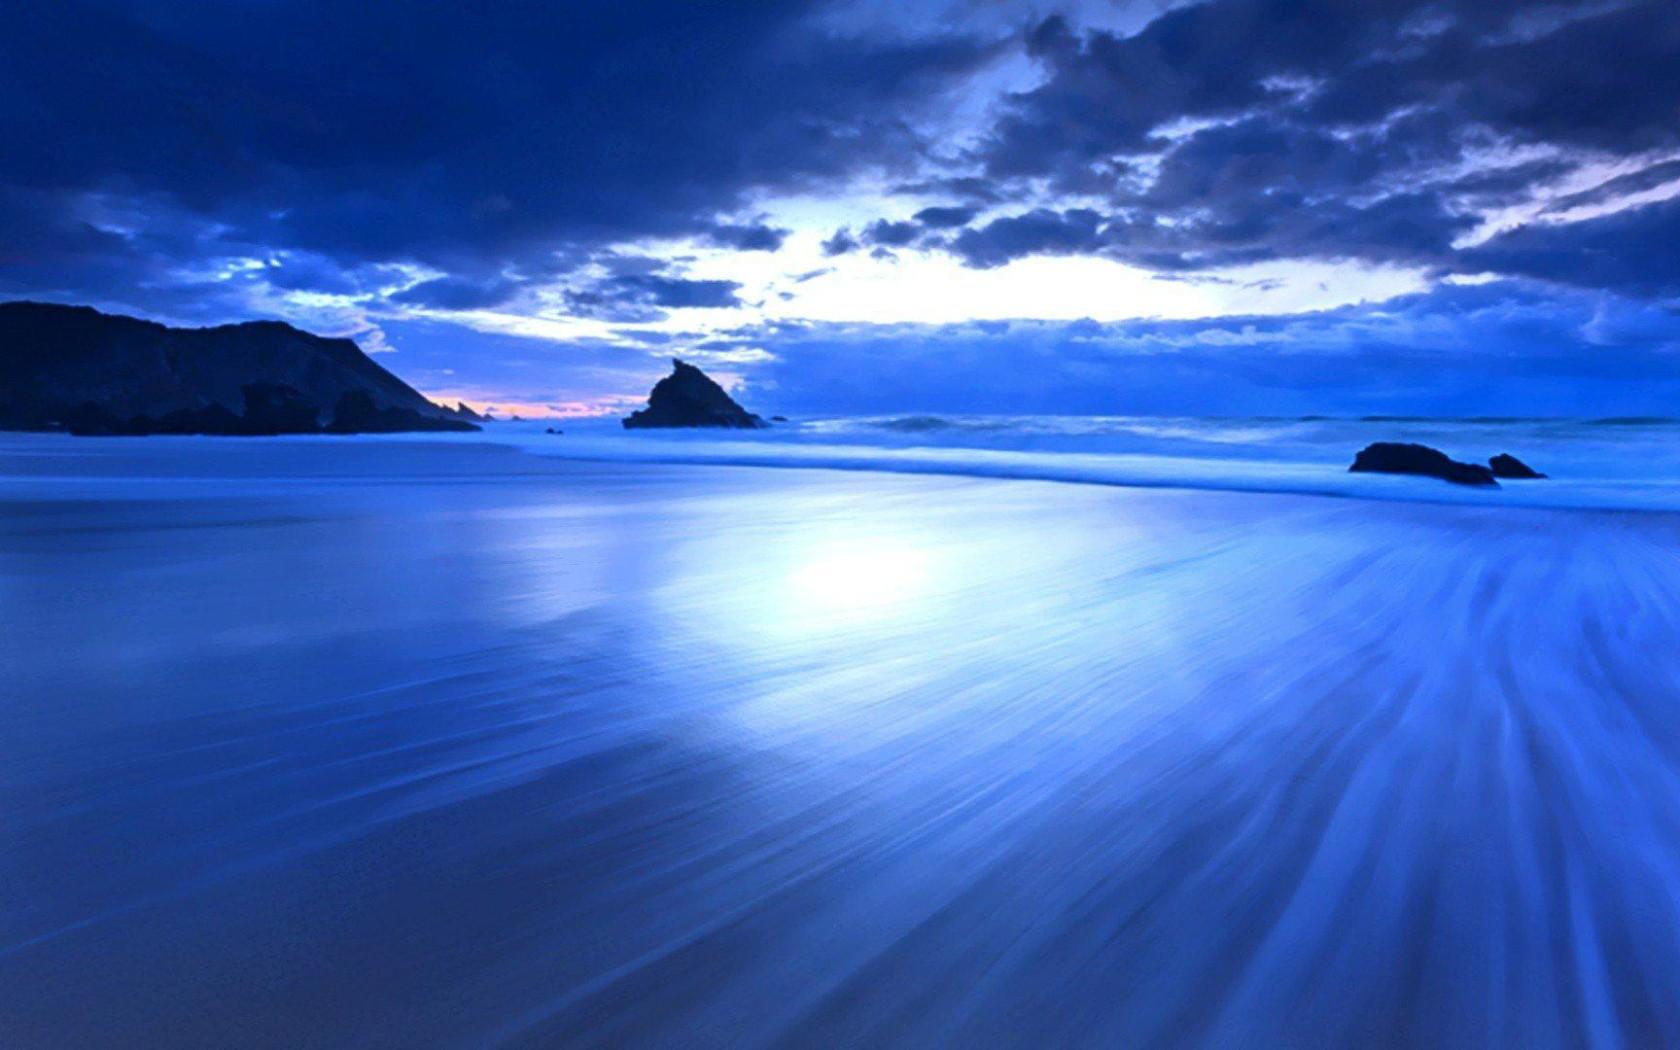 natura nuvola oceano scogliera paesaggio citt UltraHD sfondo 4k HD Wallpaper gratis widescreen